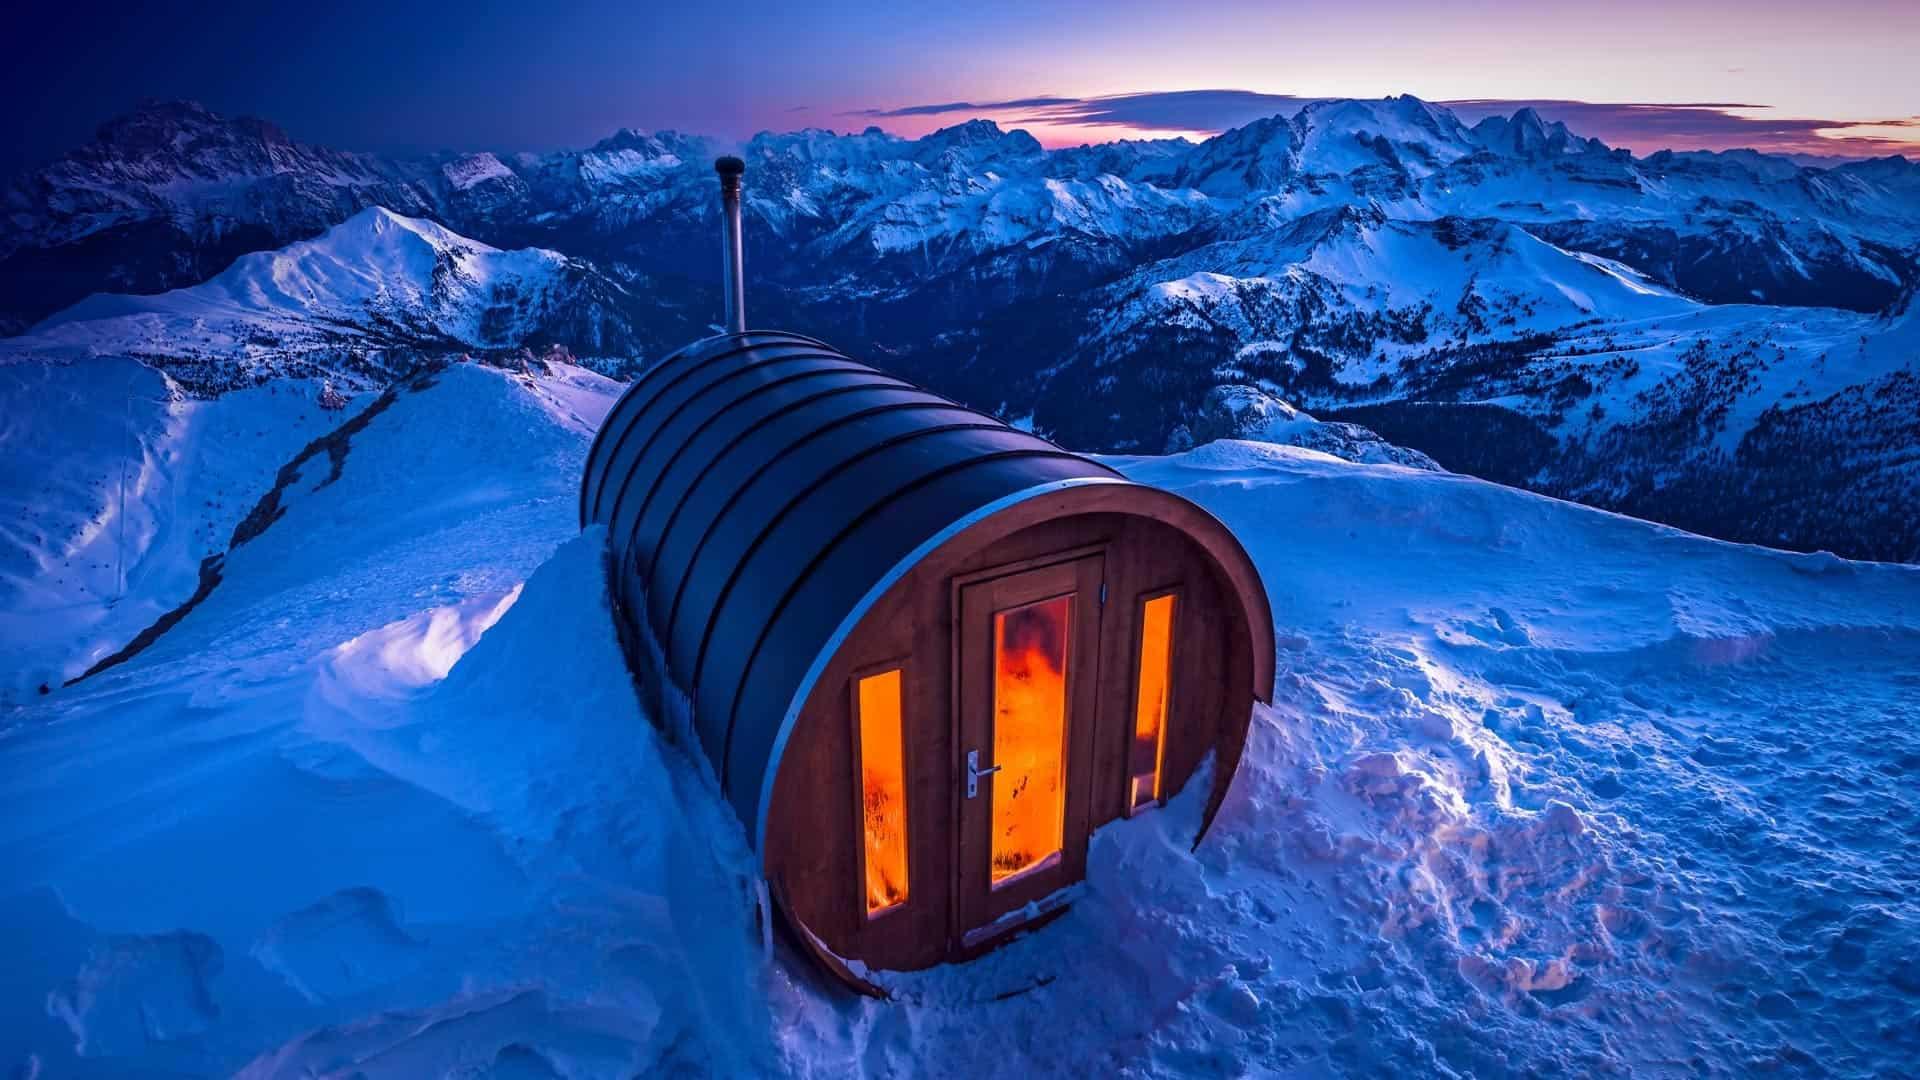 Rifugio Lagazuoi in the Italian Dolomites